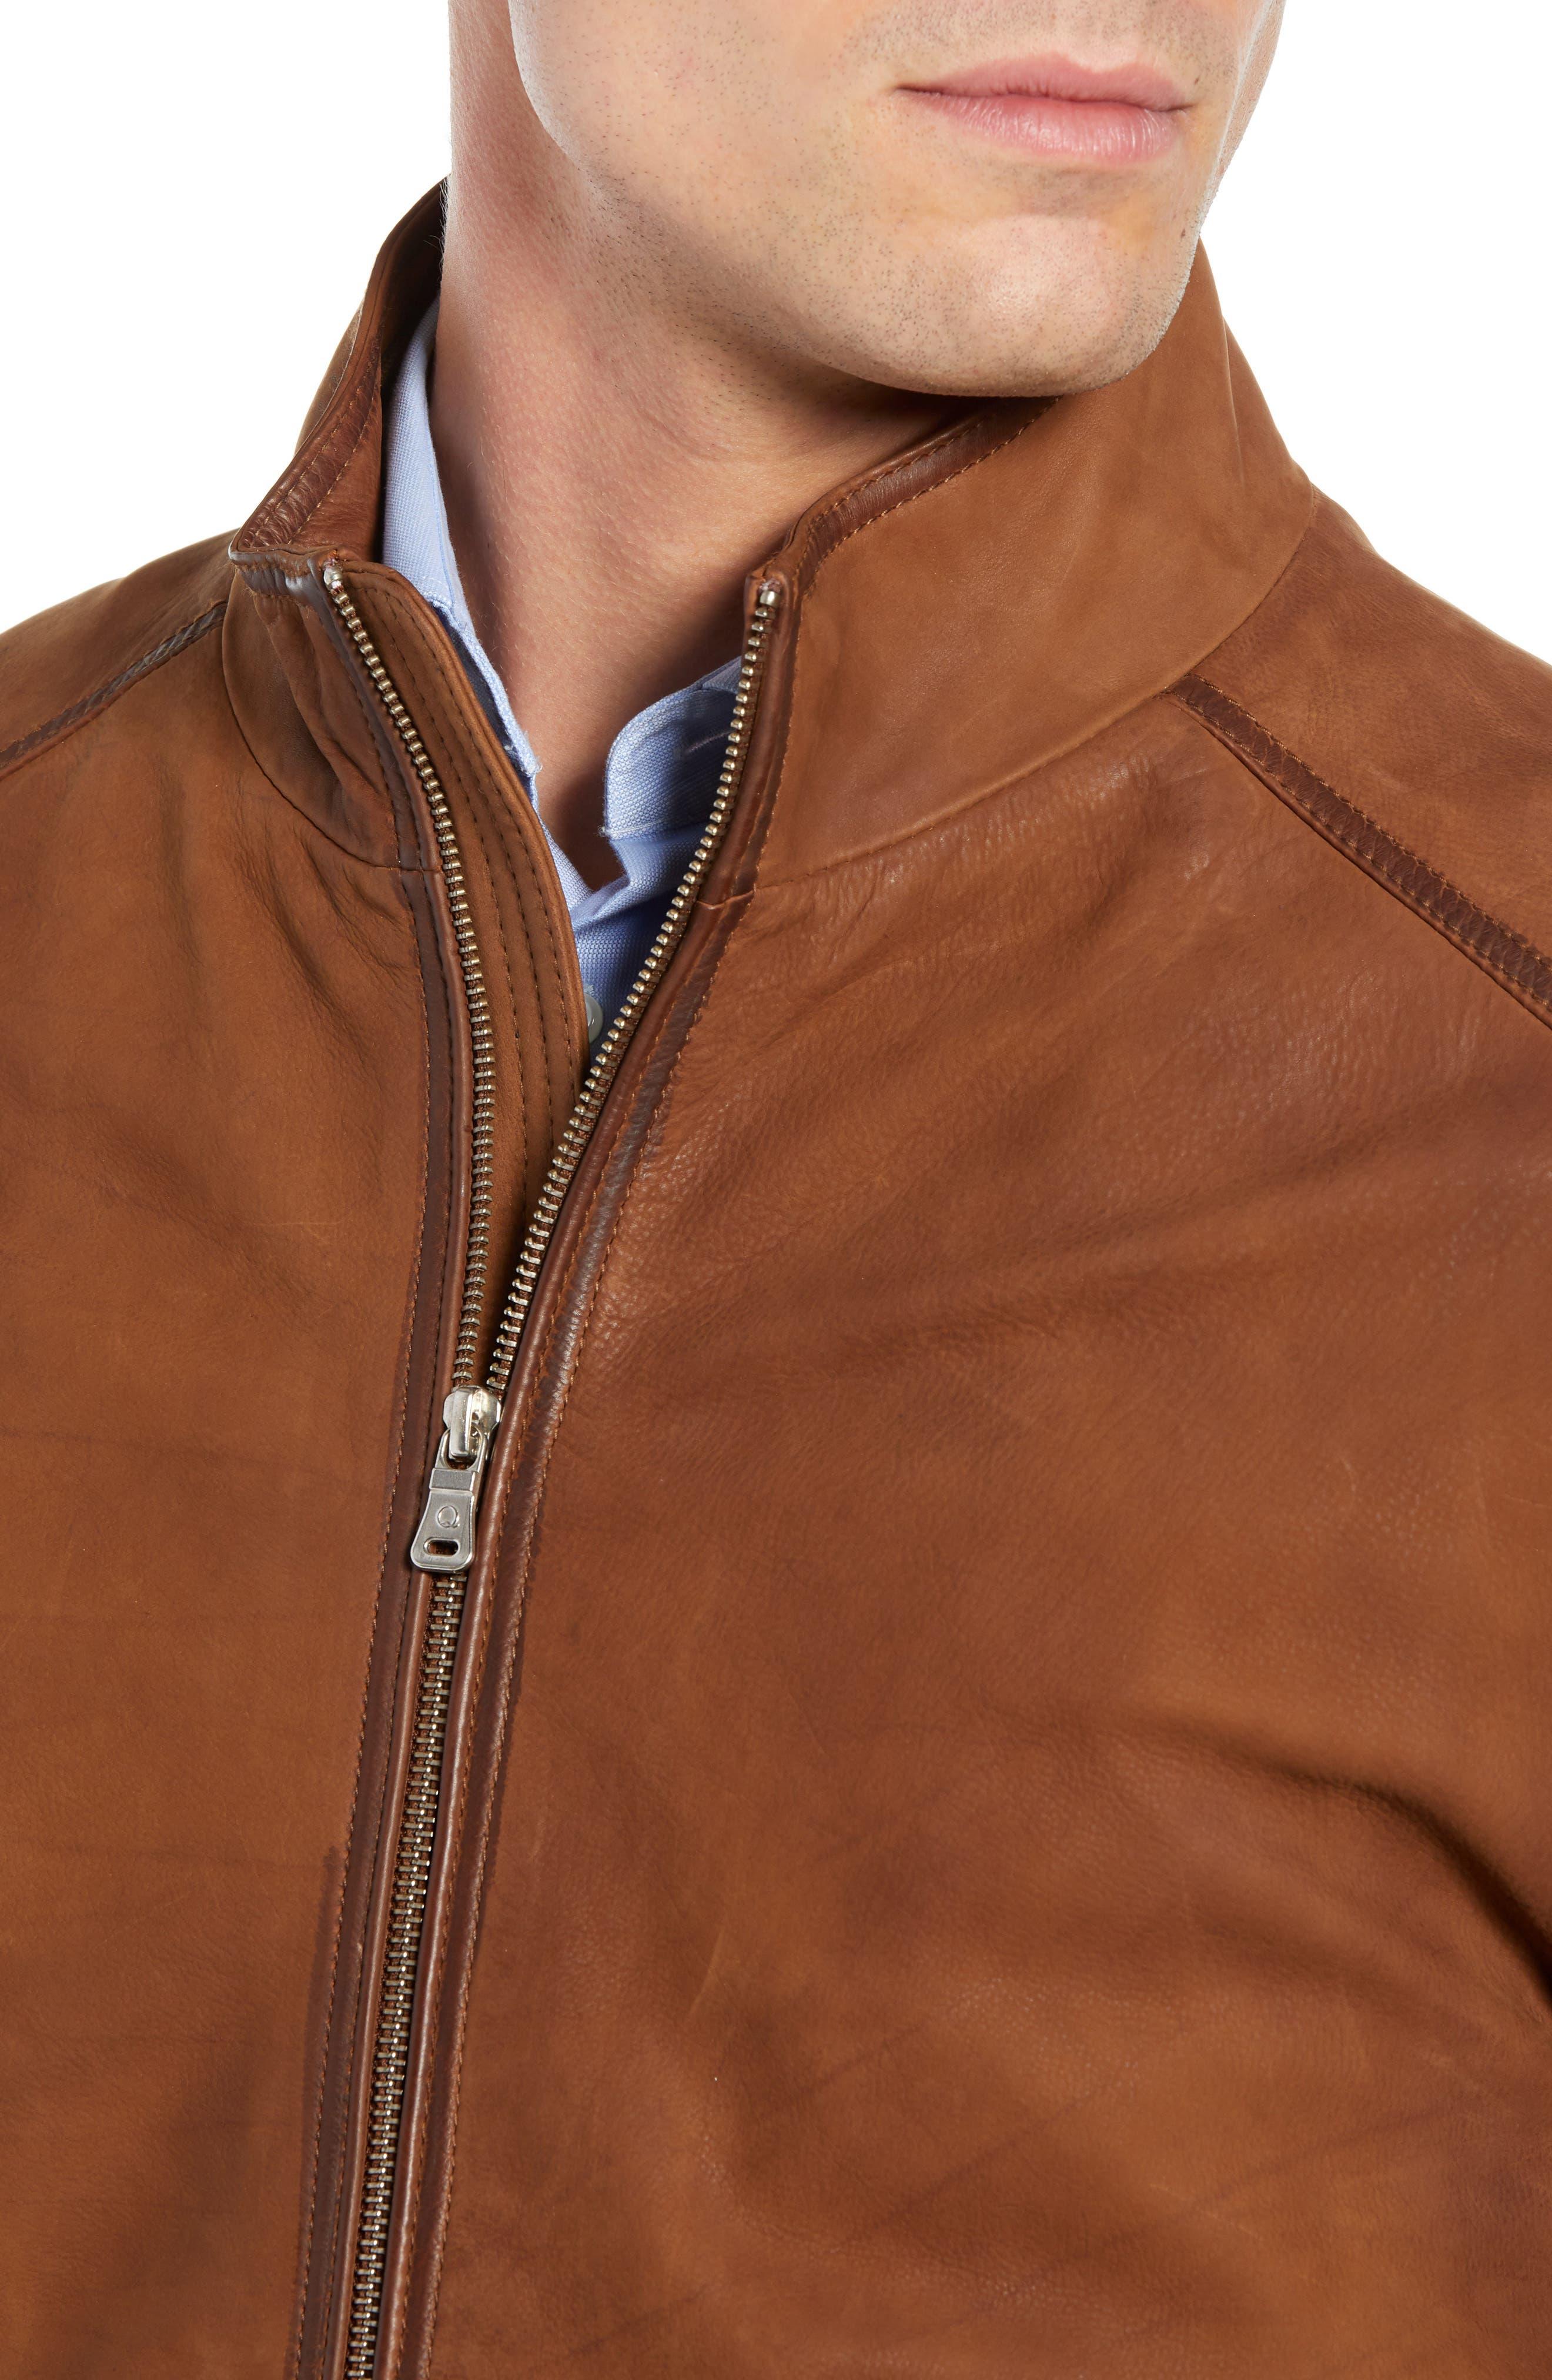 Regular Fit Leather Moto Jacket,                             Alternate thumbnail 4, color,                             COGNAC